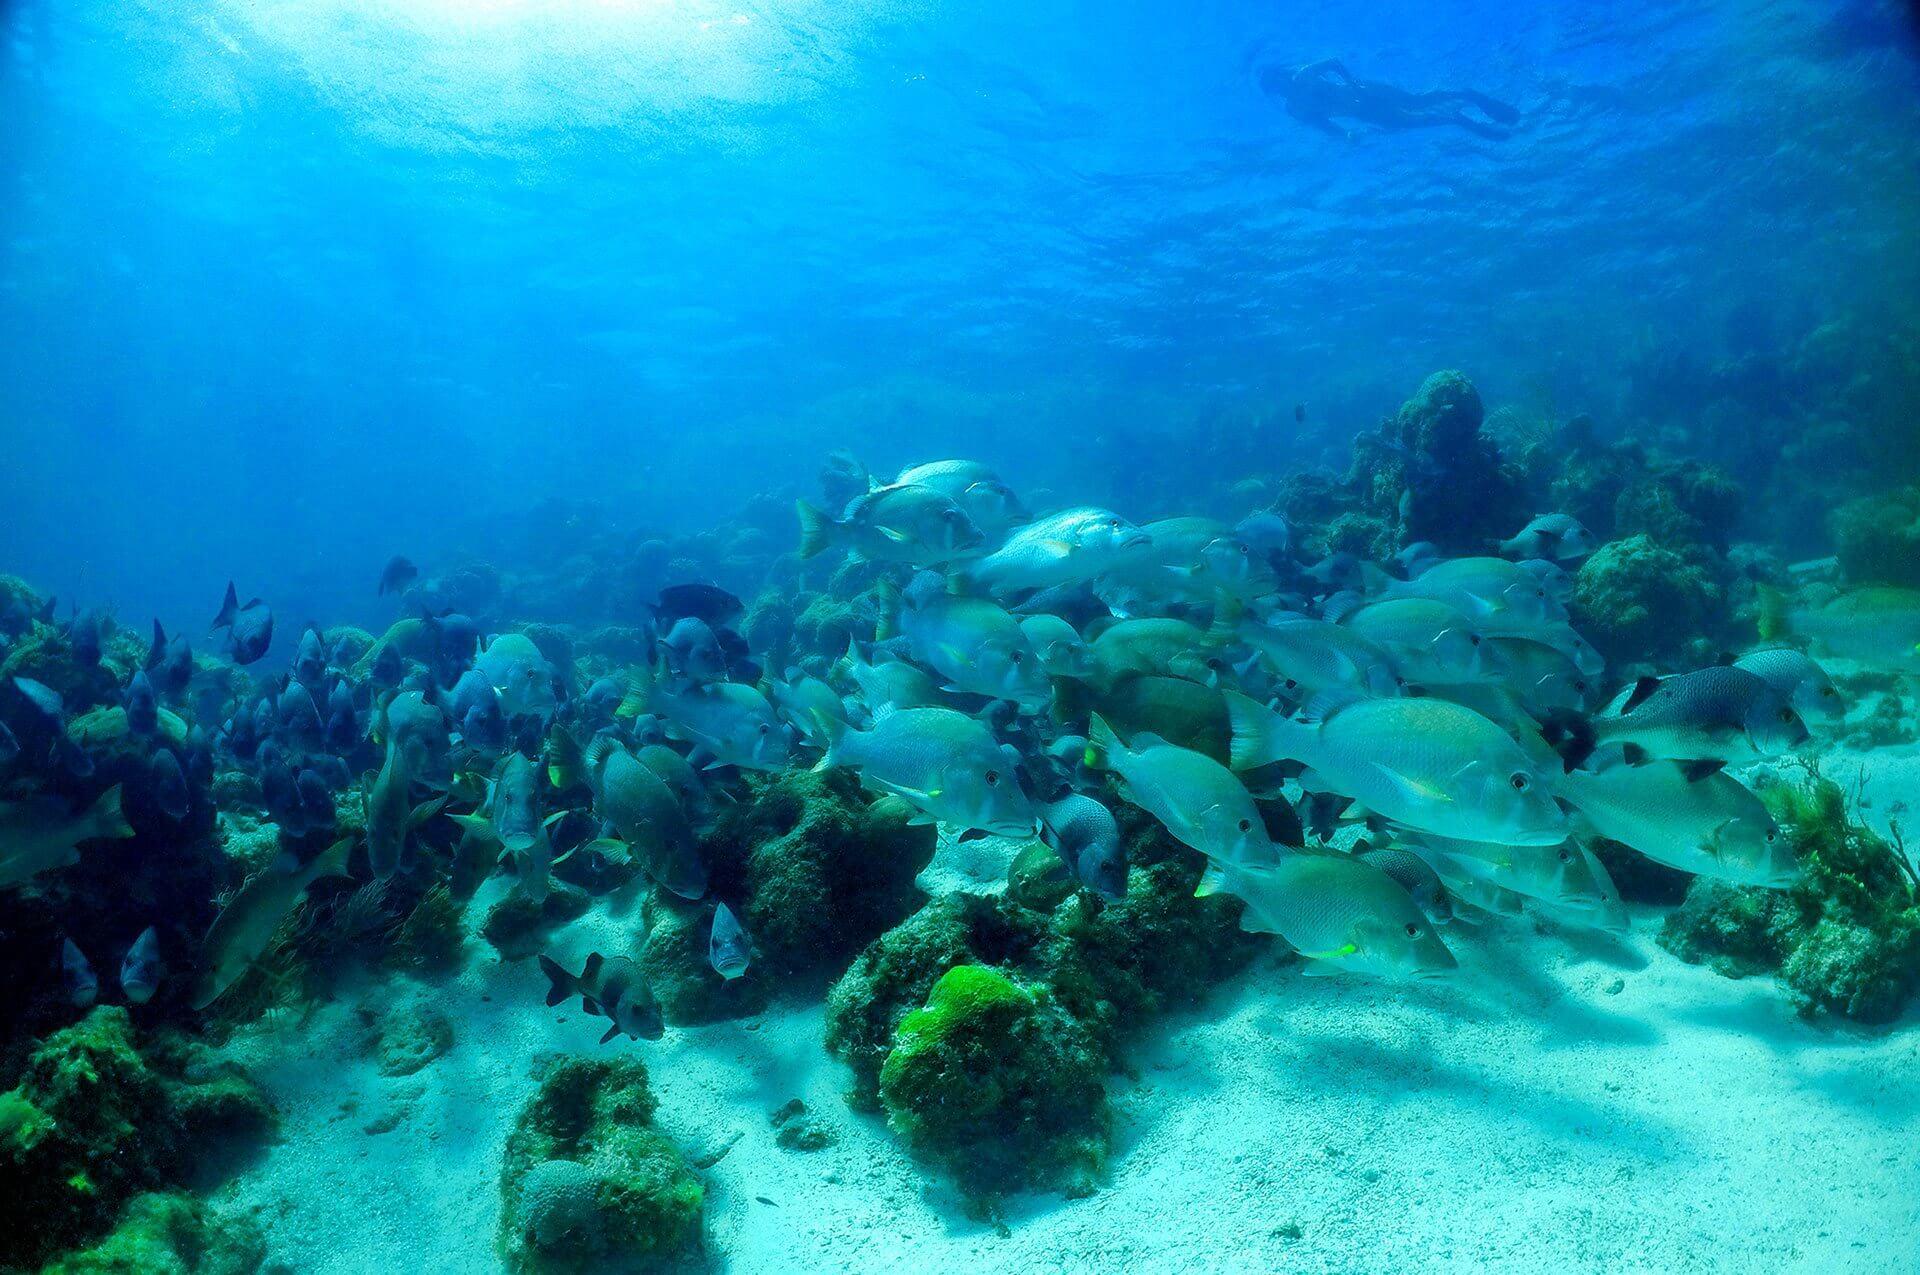 Hol Chan Marine Reserve School of Fish